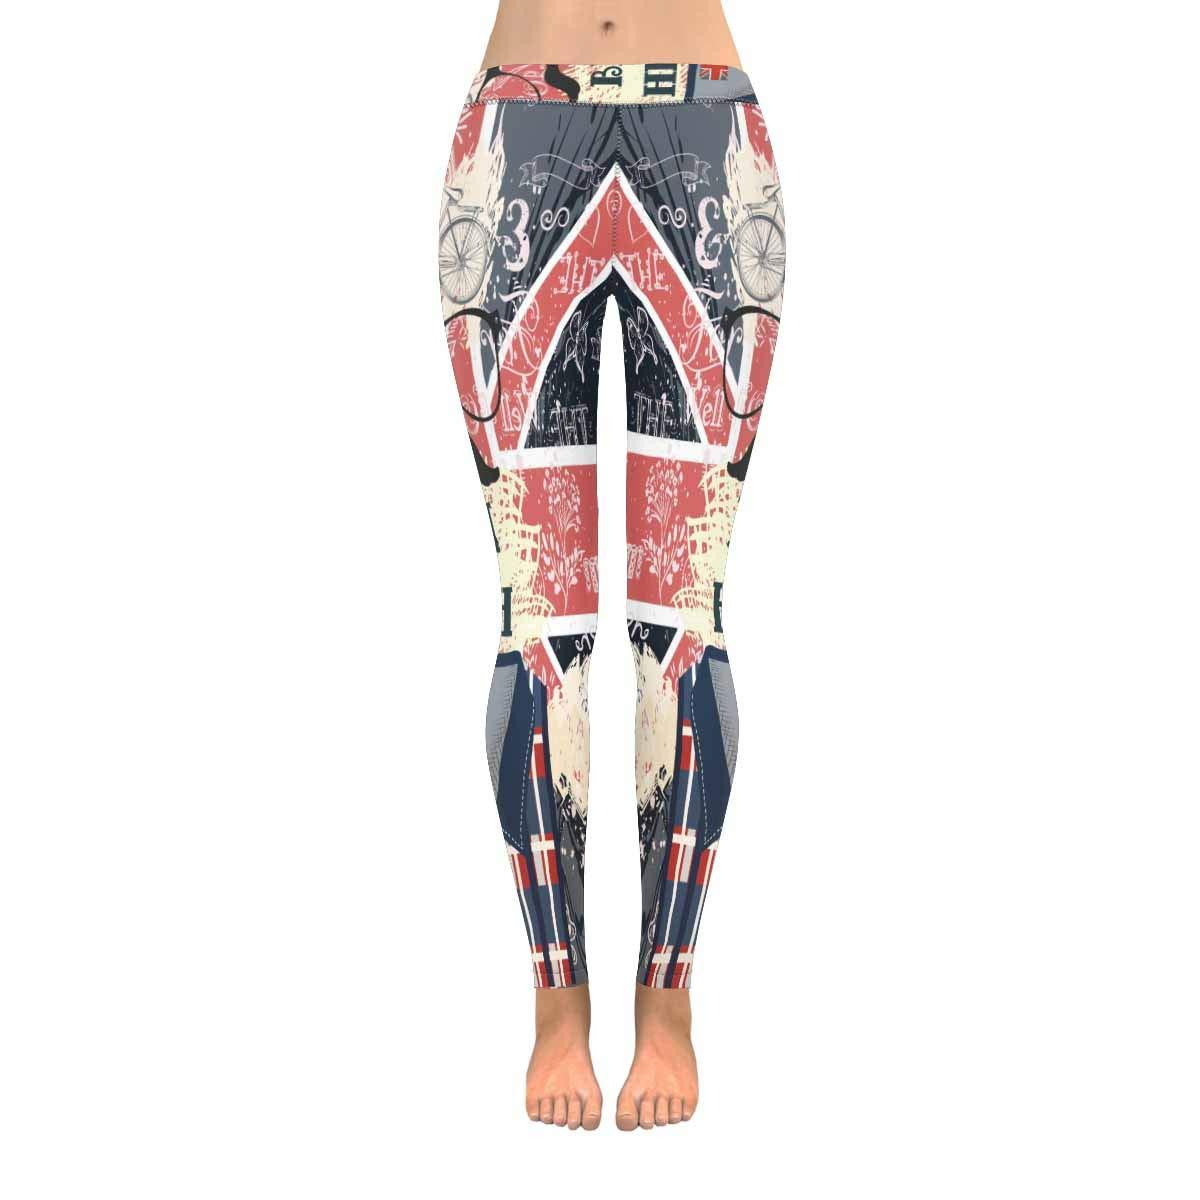 InterestPrint Hipster Bike Glasses and Mustache on British Flag Women's Capri Leggings Stretchy Skinny Yoga Pants XS